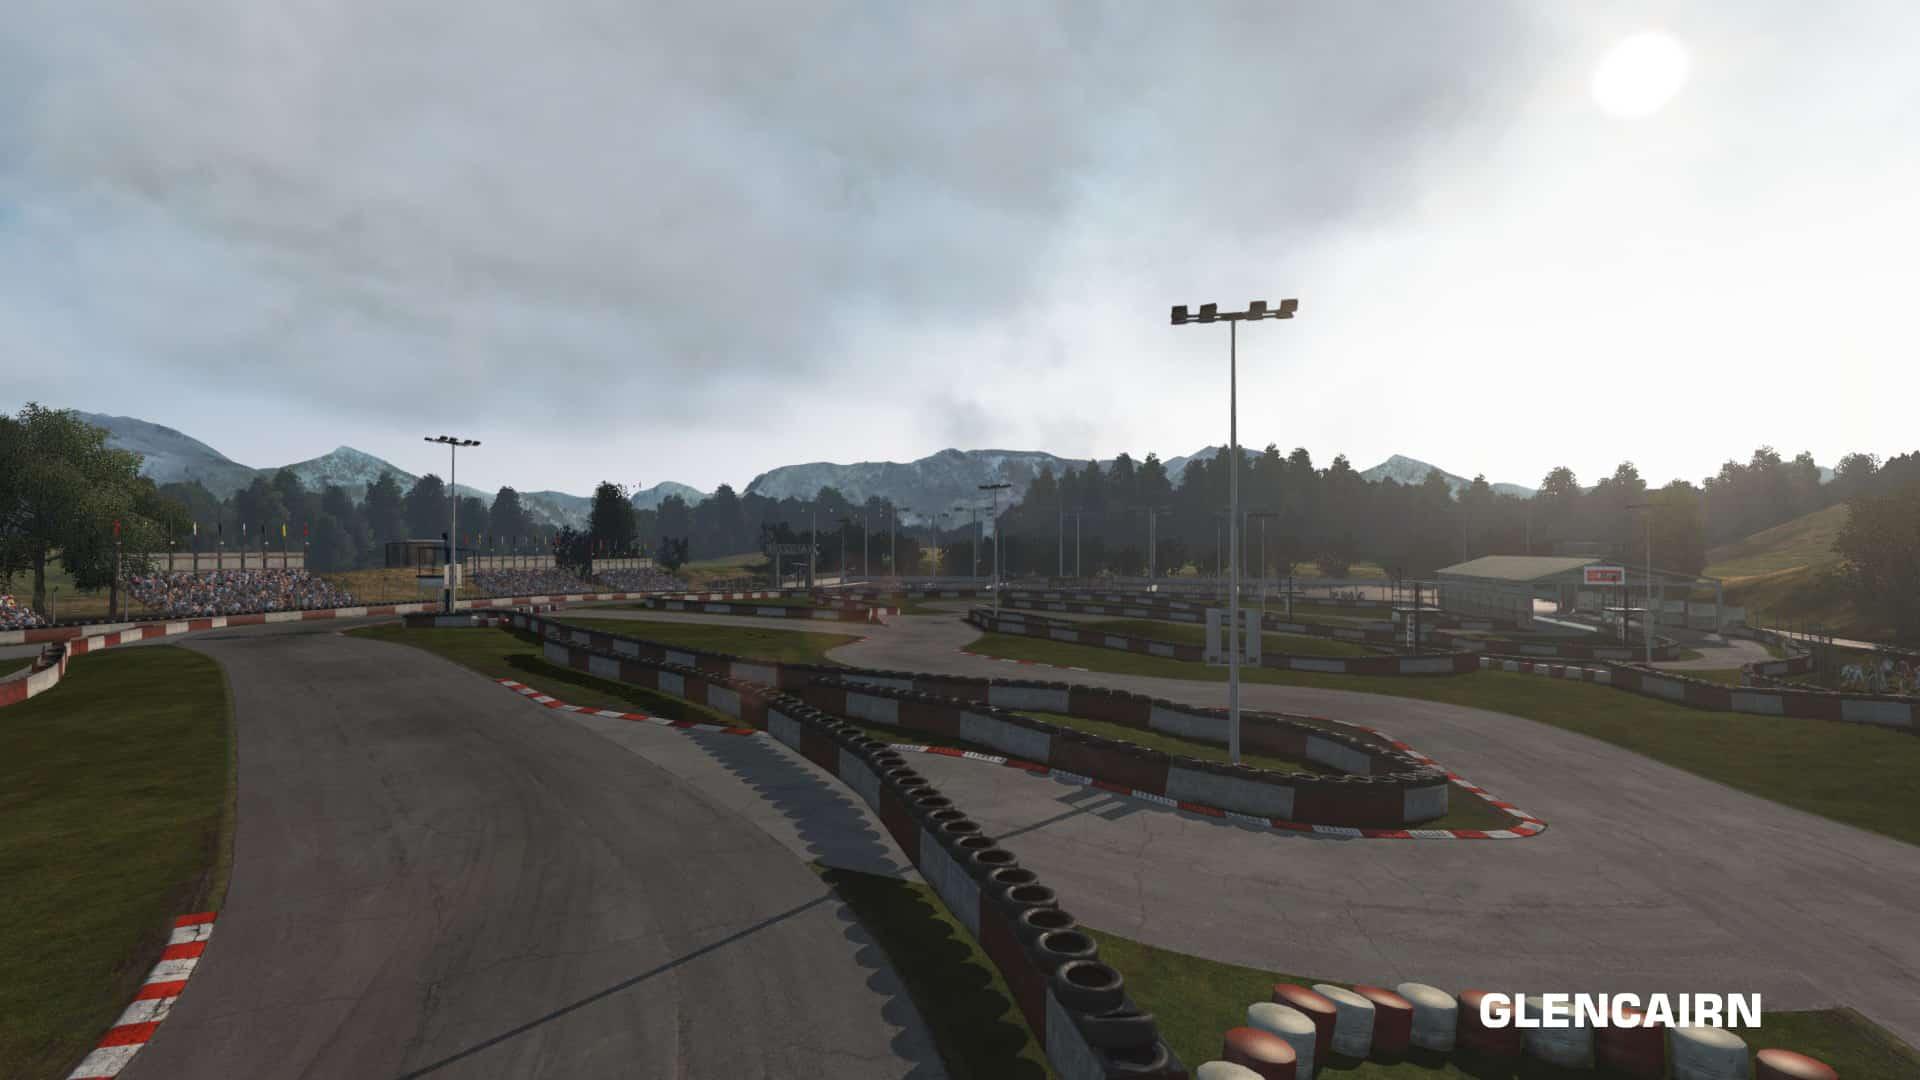 project-cars-glencairn-track